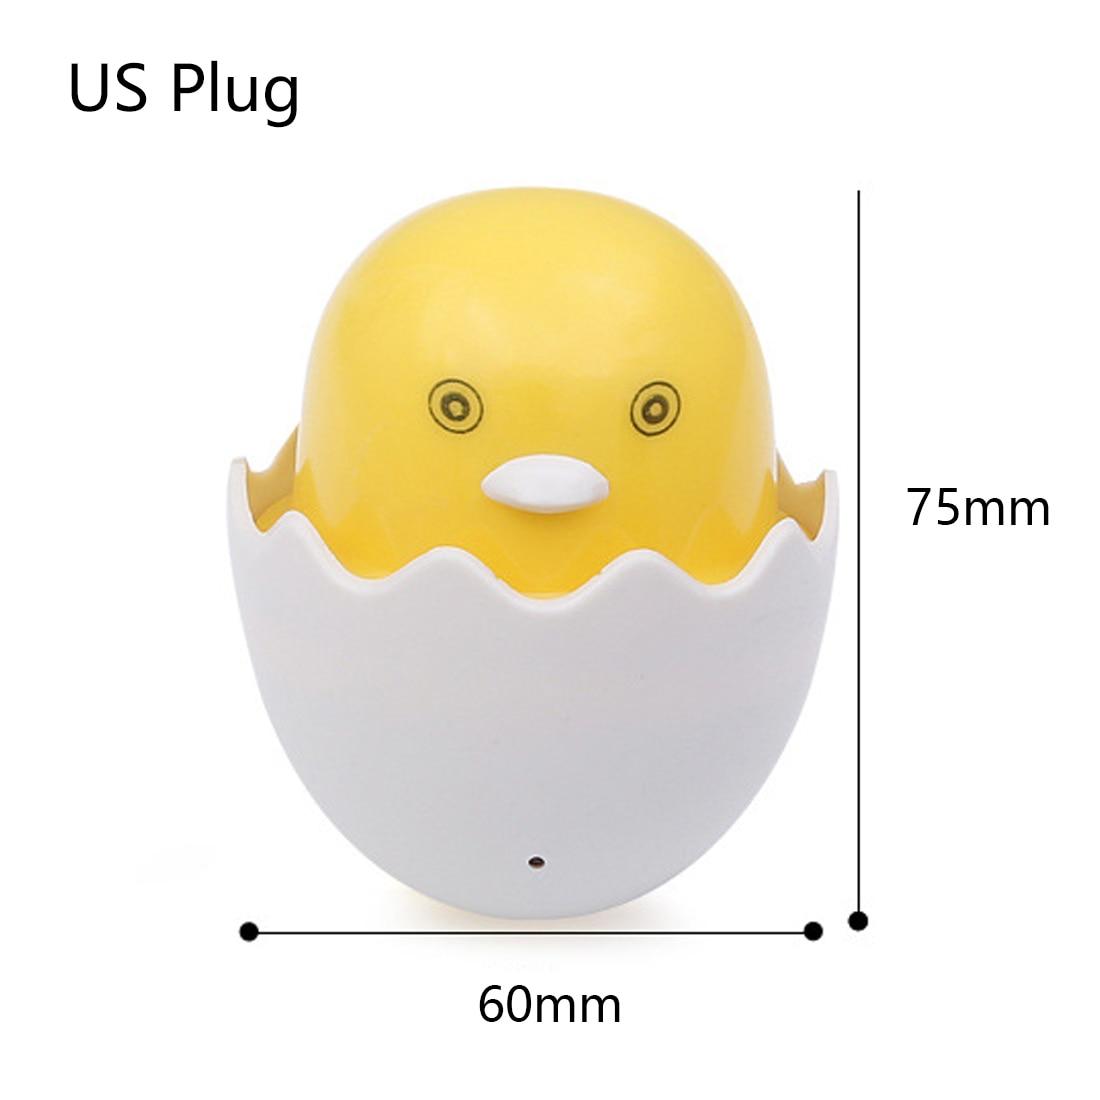 Yellow Duck US Plug Light Control Sensor Gift for Children Cute LED Night Light Wall Socket Lamps Bedroom Lamp AC 110-220V